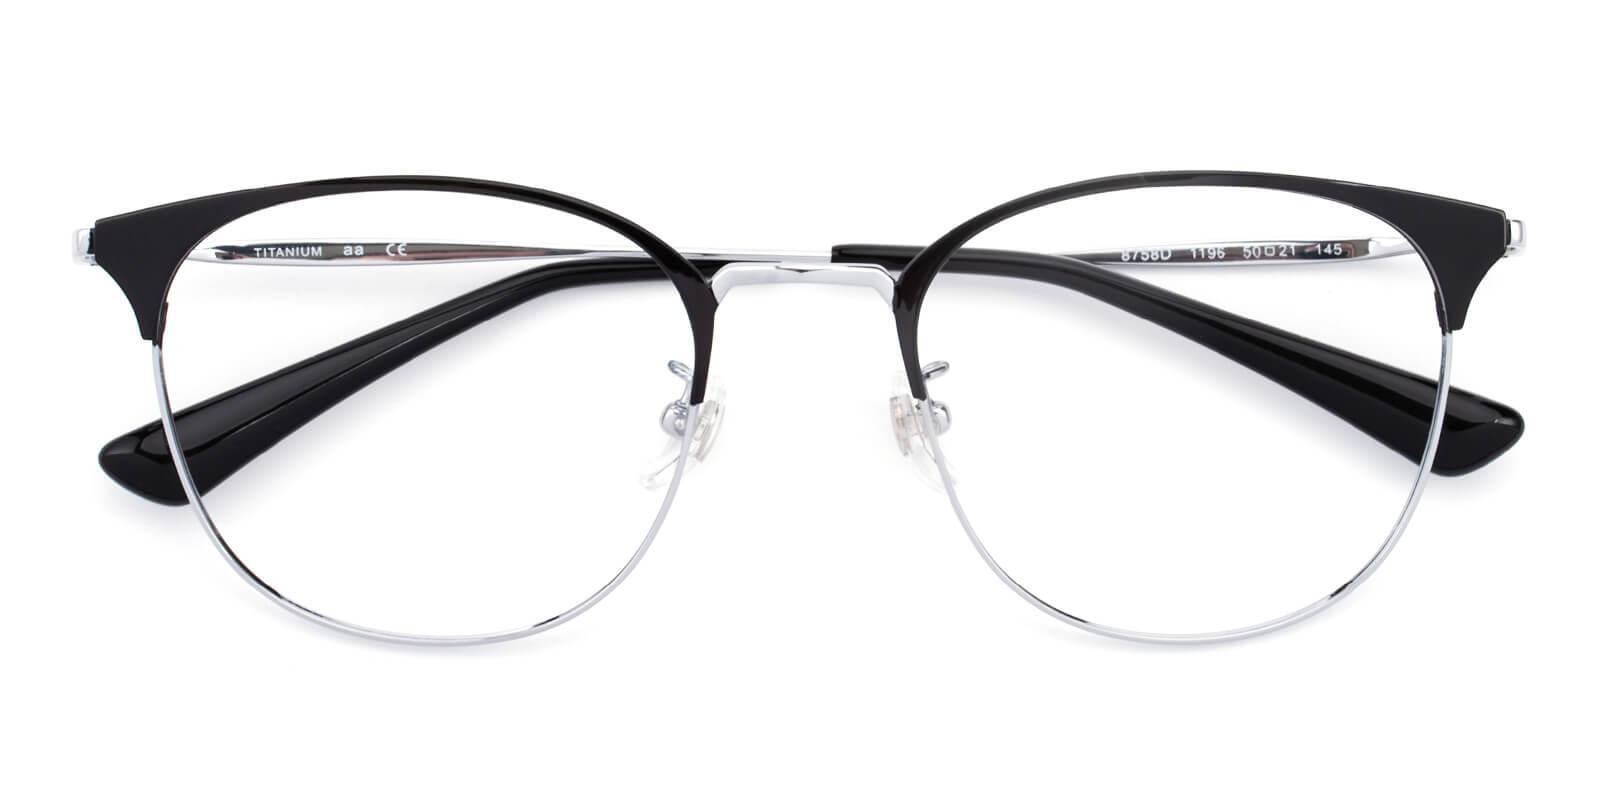 Belle-Silver-Cat-Titanium-Eyeglasses-detail